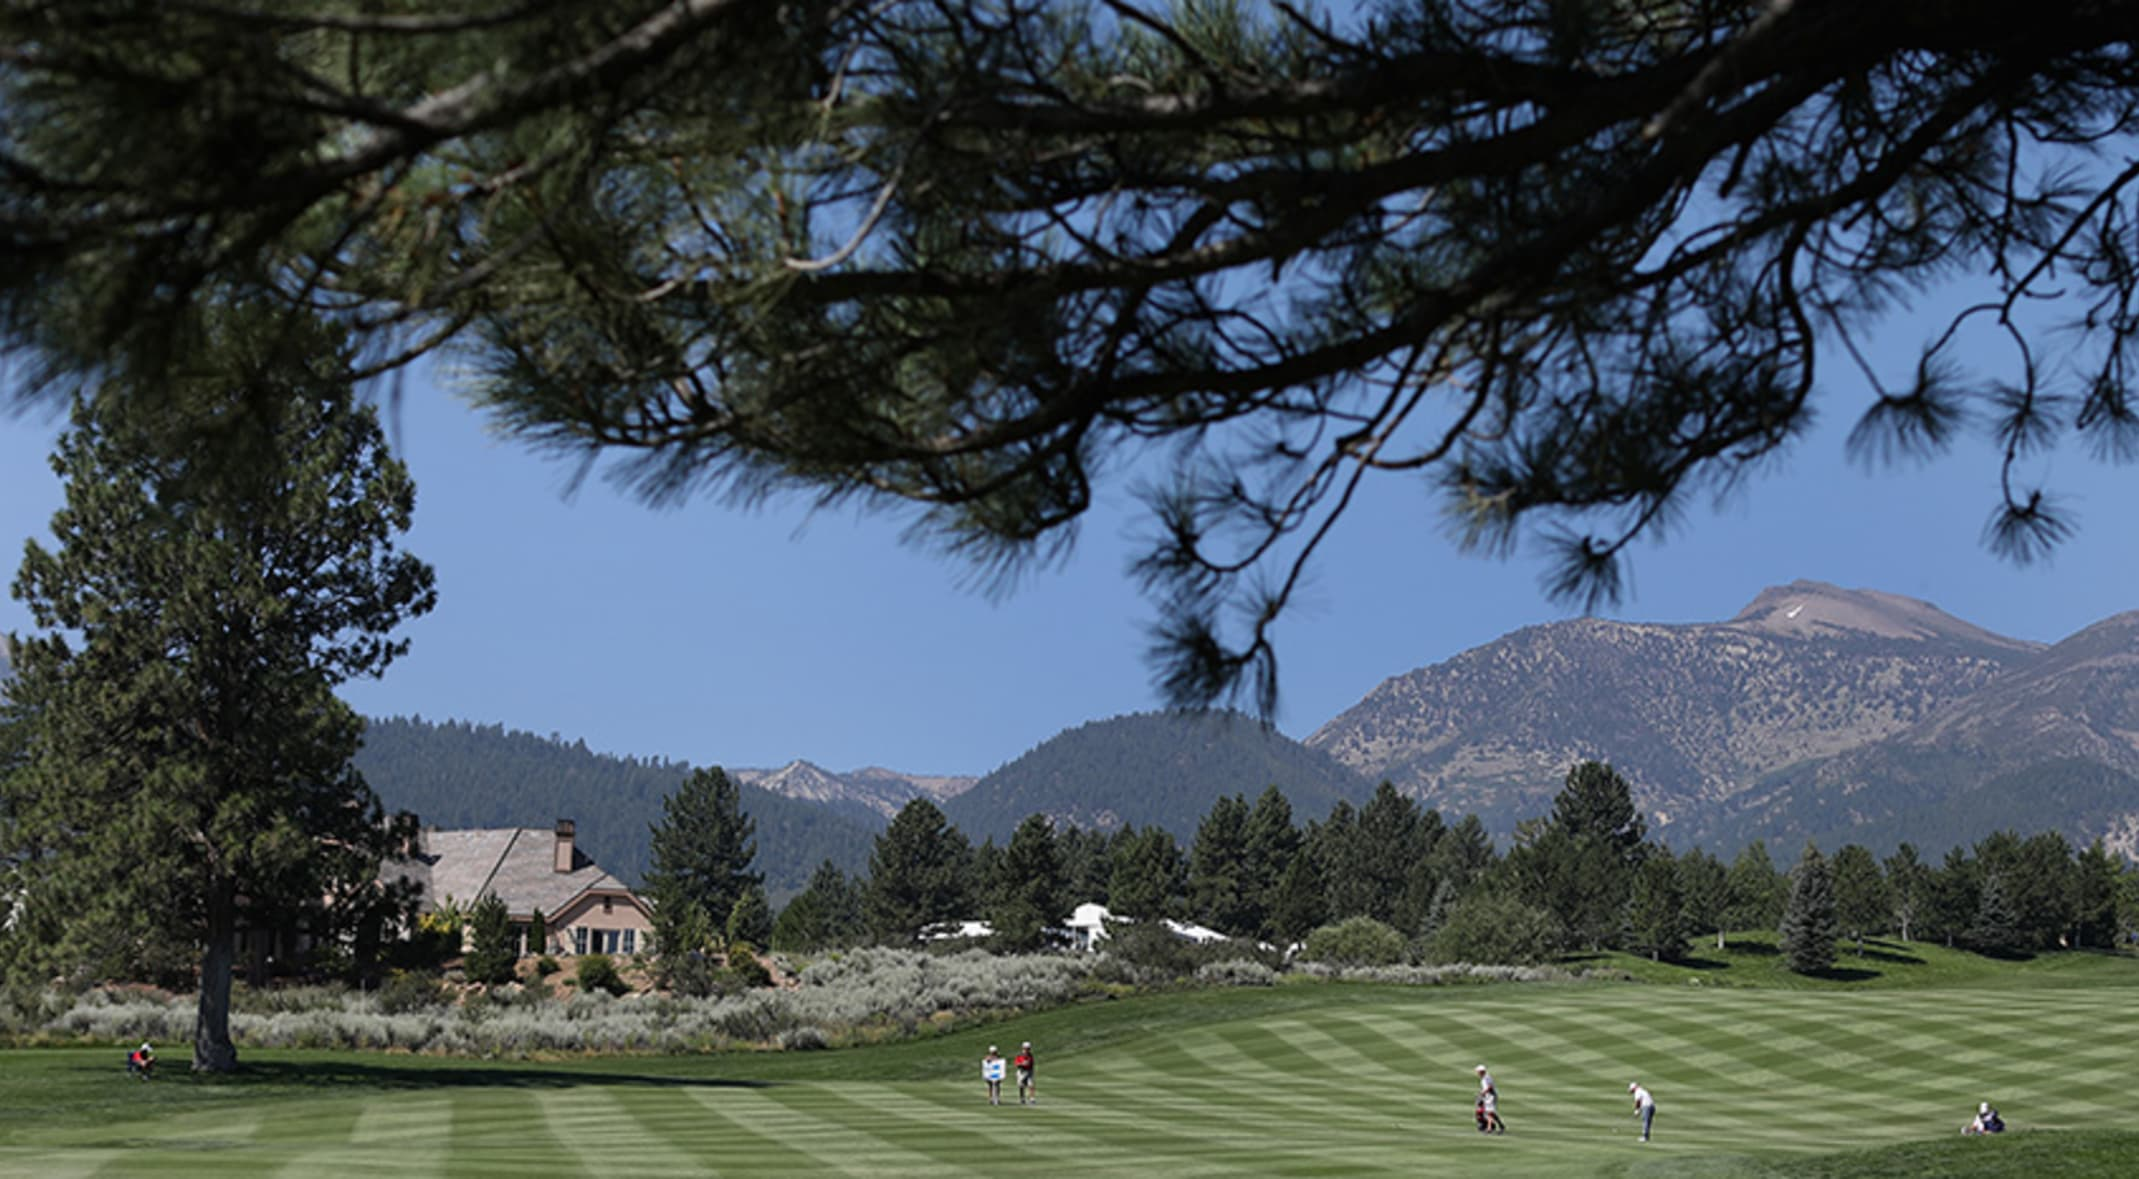 Henry 'Skip' Monge from Reno-Tahoe Tournament honored as